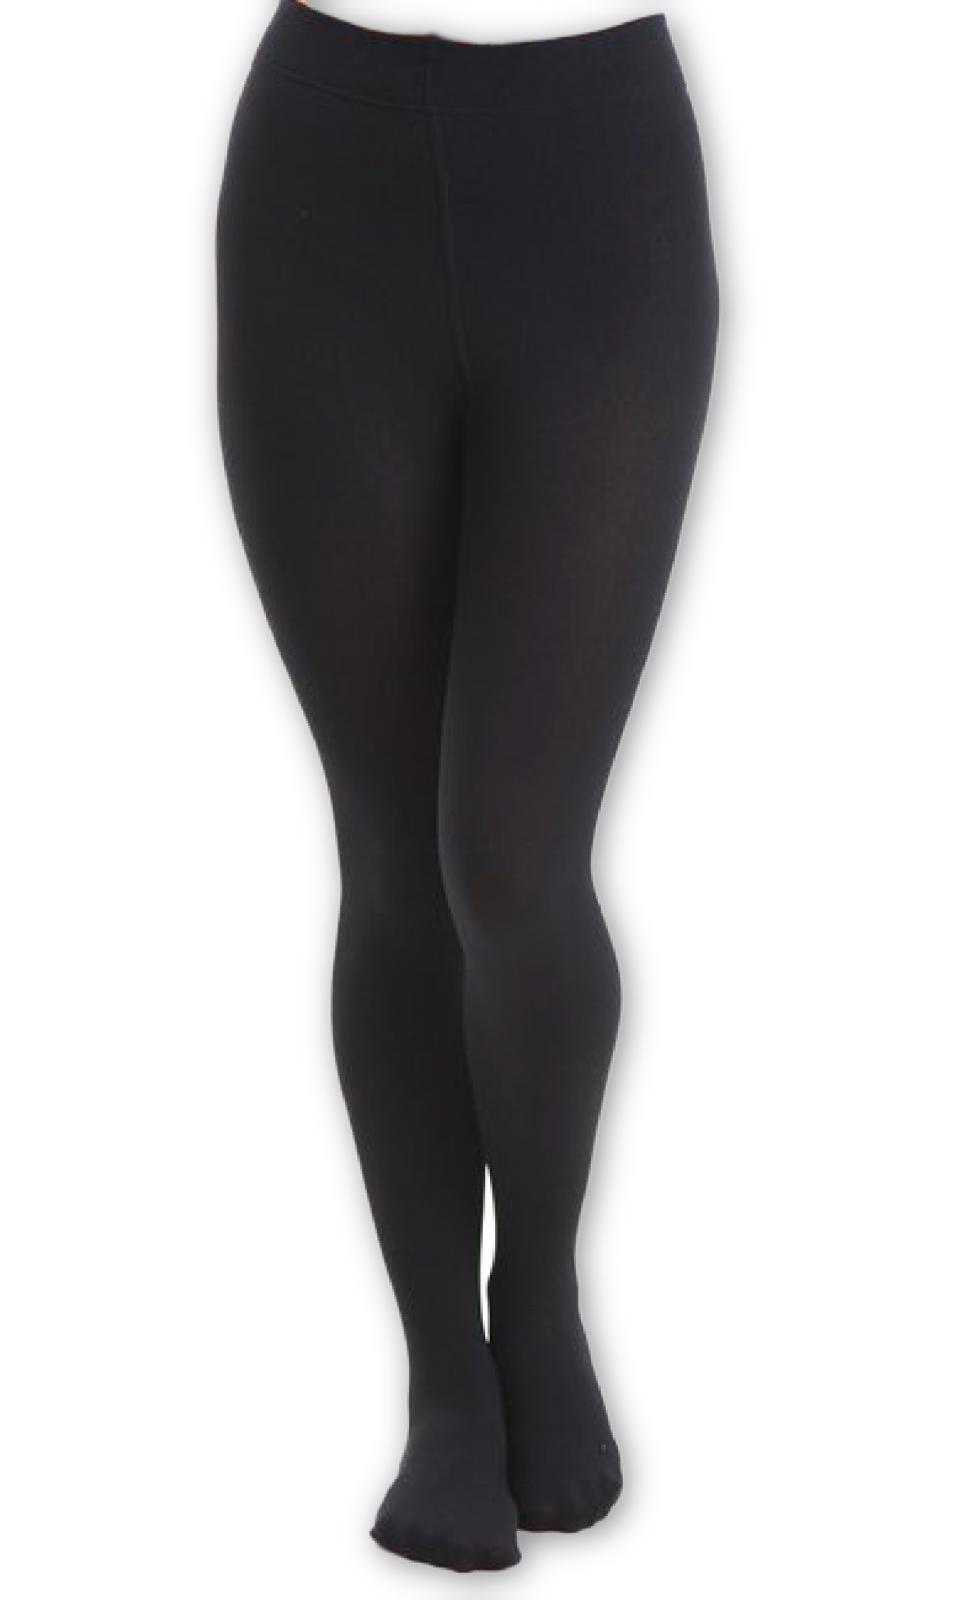 0f37078667f Ladies Thermal Black Tights Fleece Thick Winter Warm 200 Denier Appearance